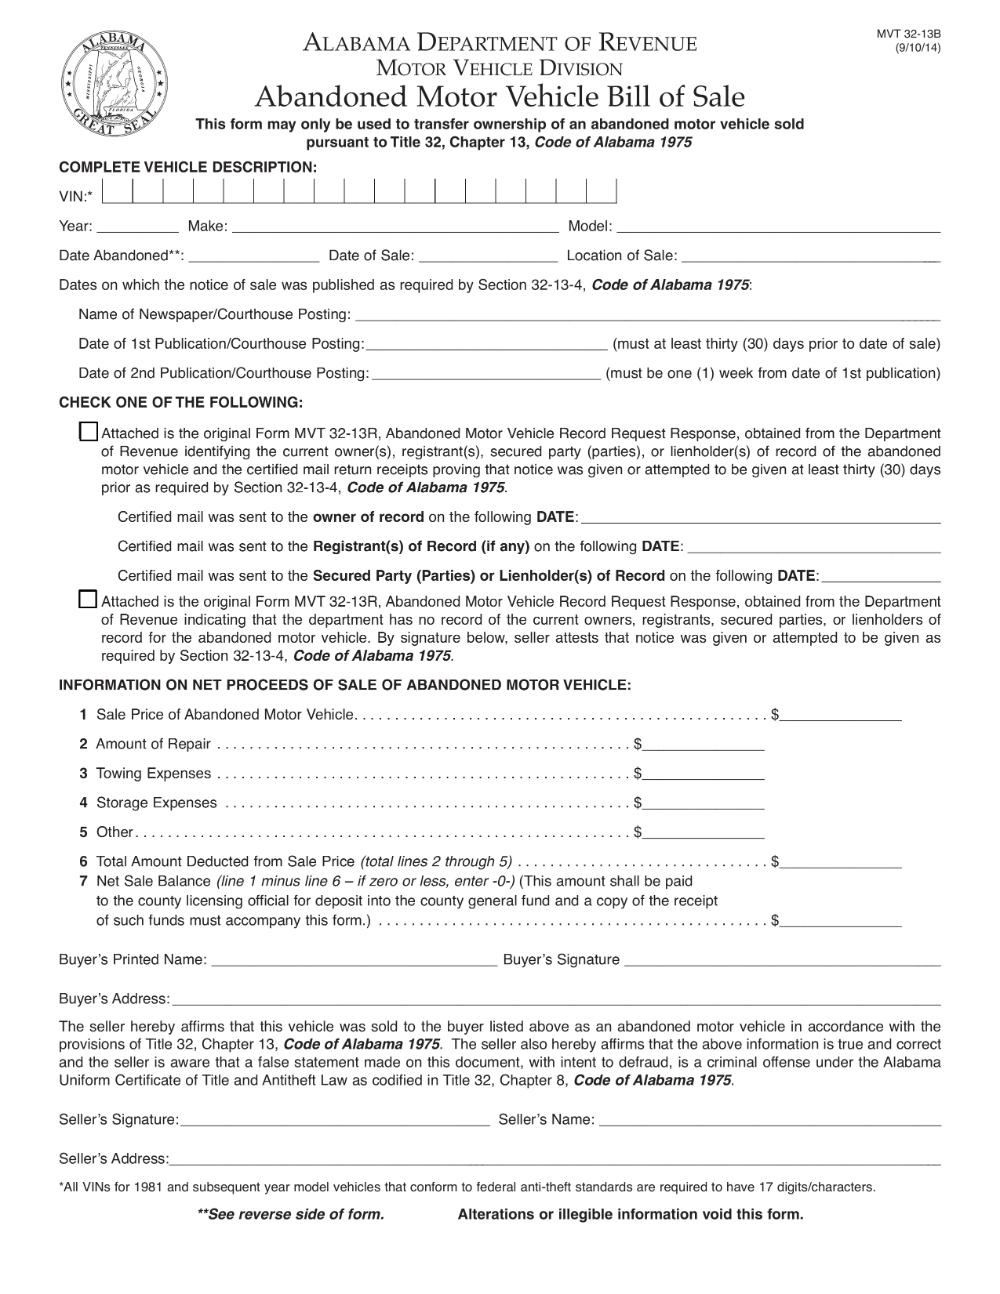 Alabama Abandoned Motor Vehicle Bill Of Sale Form Mvt 32 13b Eforms Free Fillable Forms Bills Letter Of Employment Motor Car